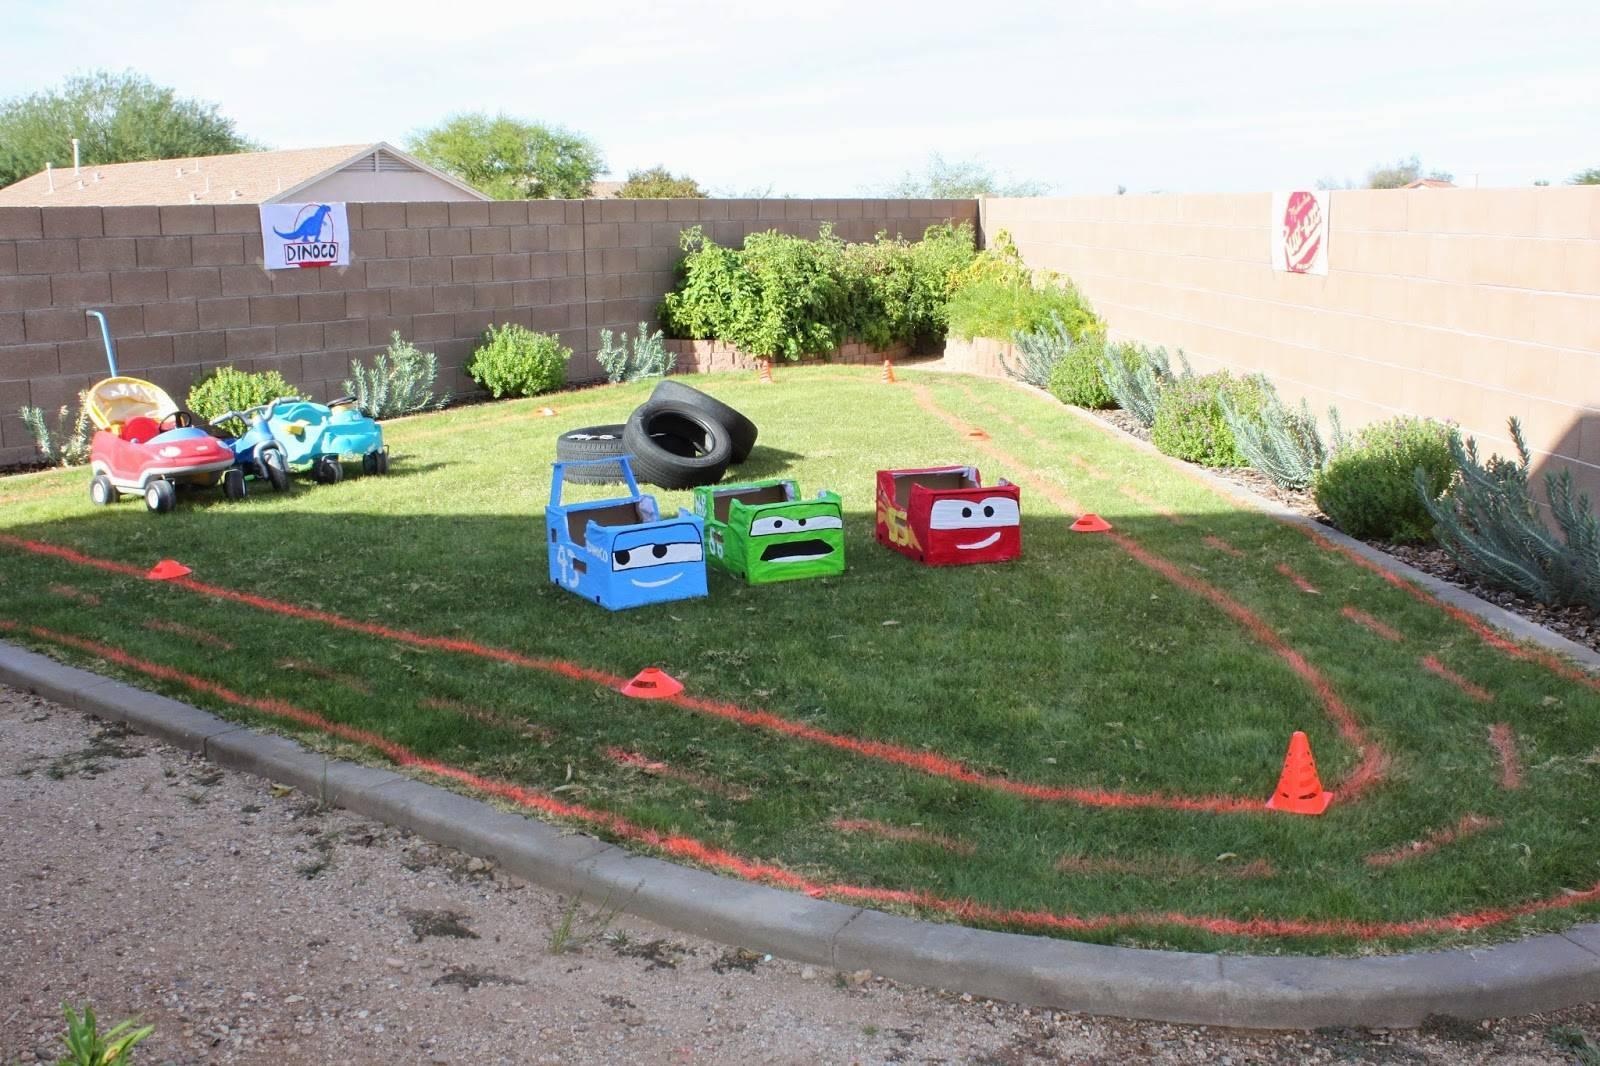 Race track on grass